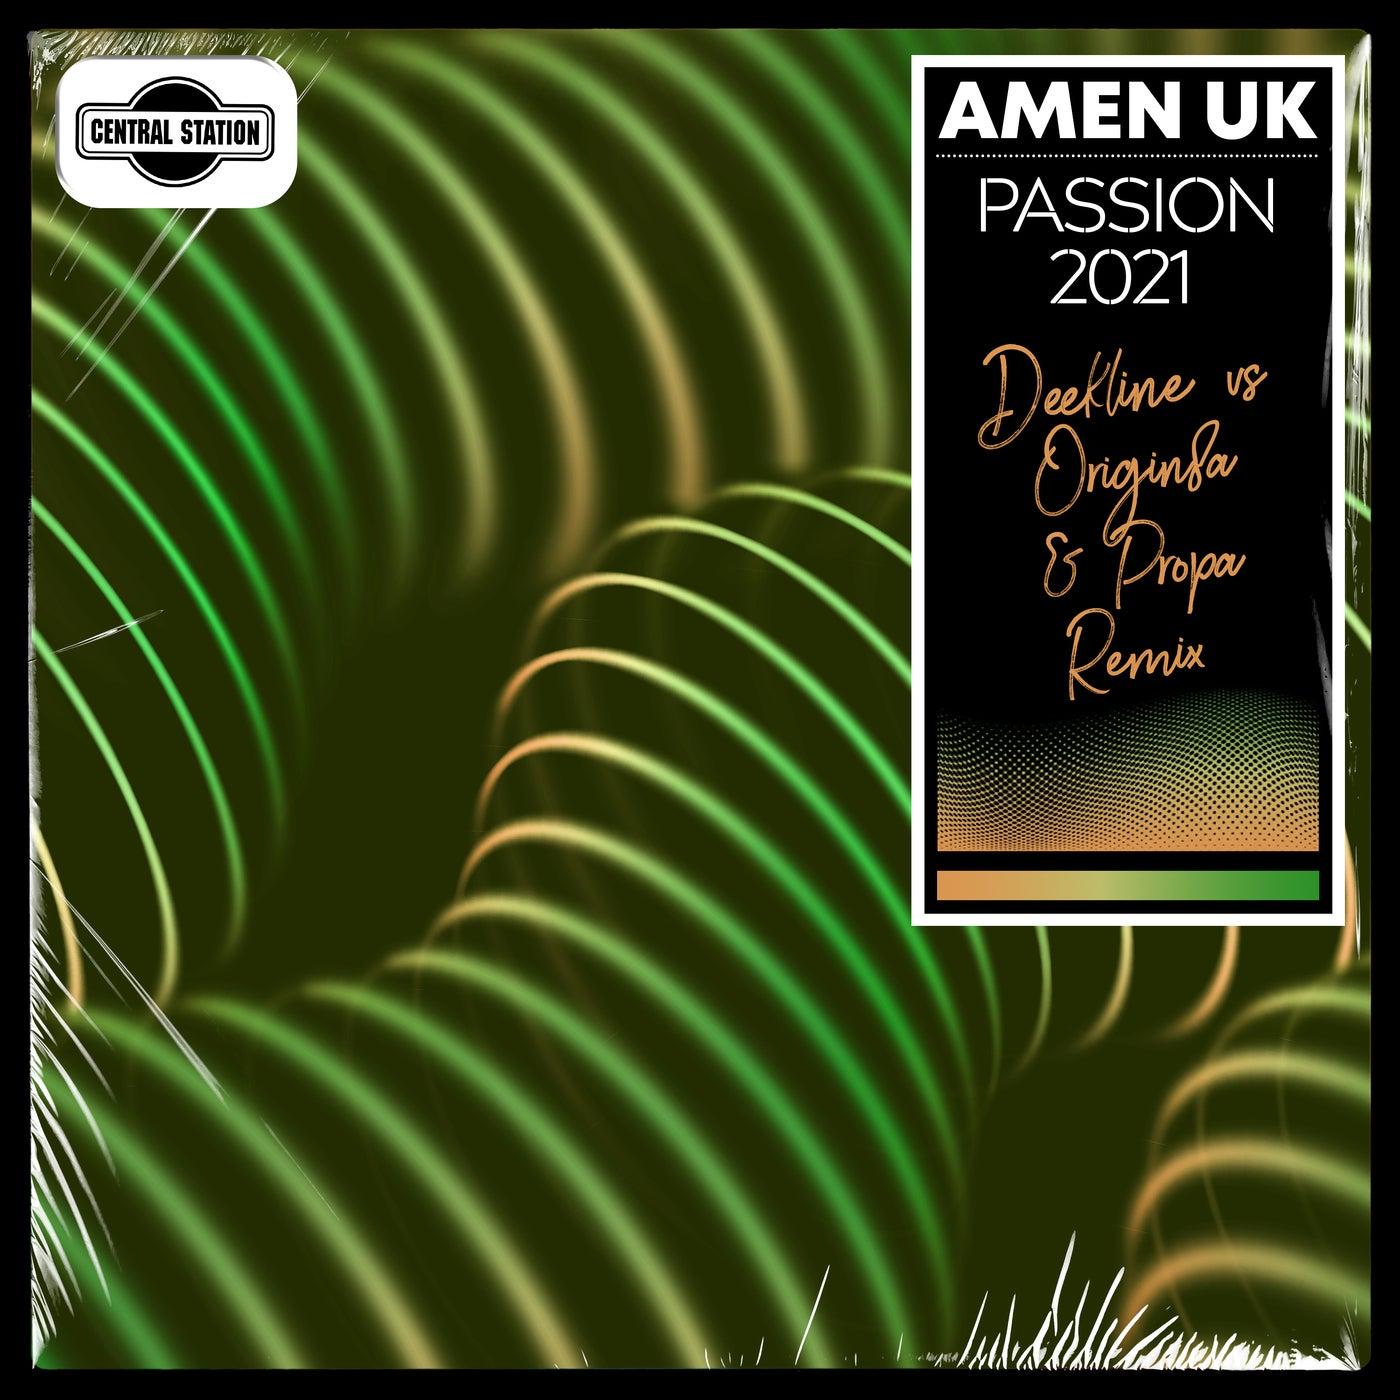 Passion 2021 (Deekline vs. Origin8a & Propa Extended Remix)